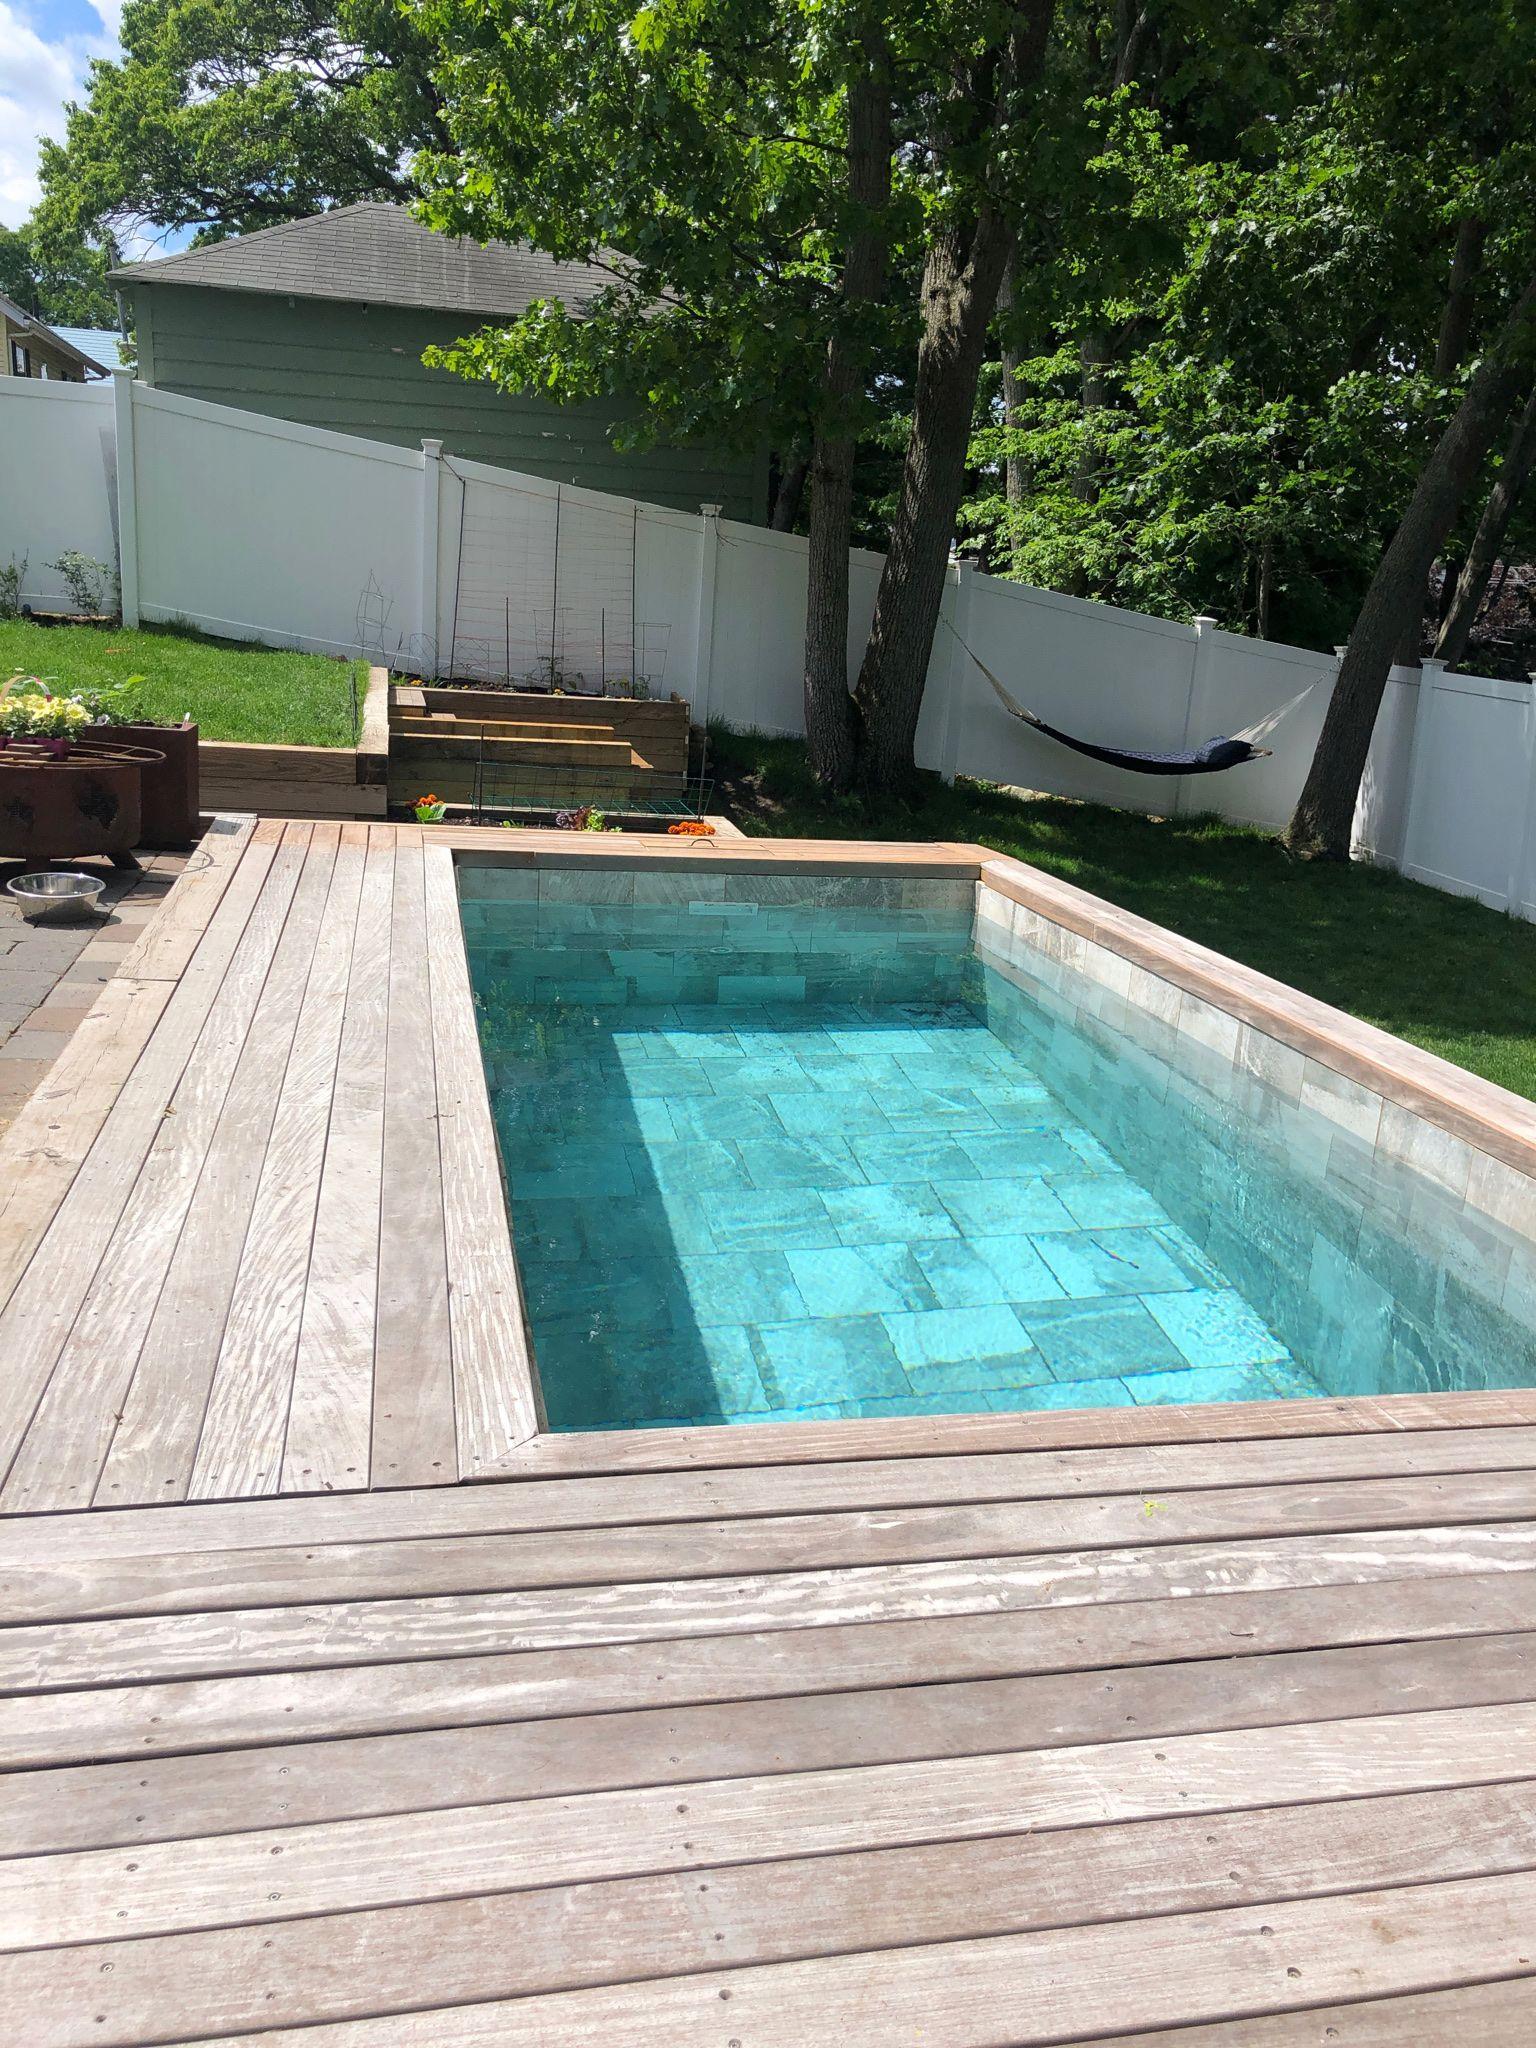 Backyard Plunge Pool Design Small Swimming Pools Swimming Pool Landscaping Small Pool Design